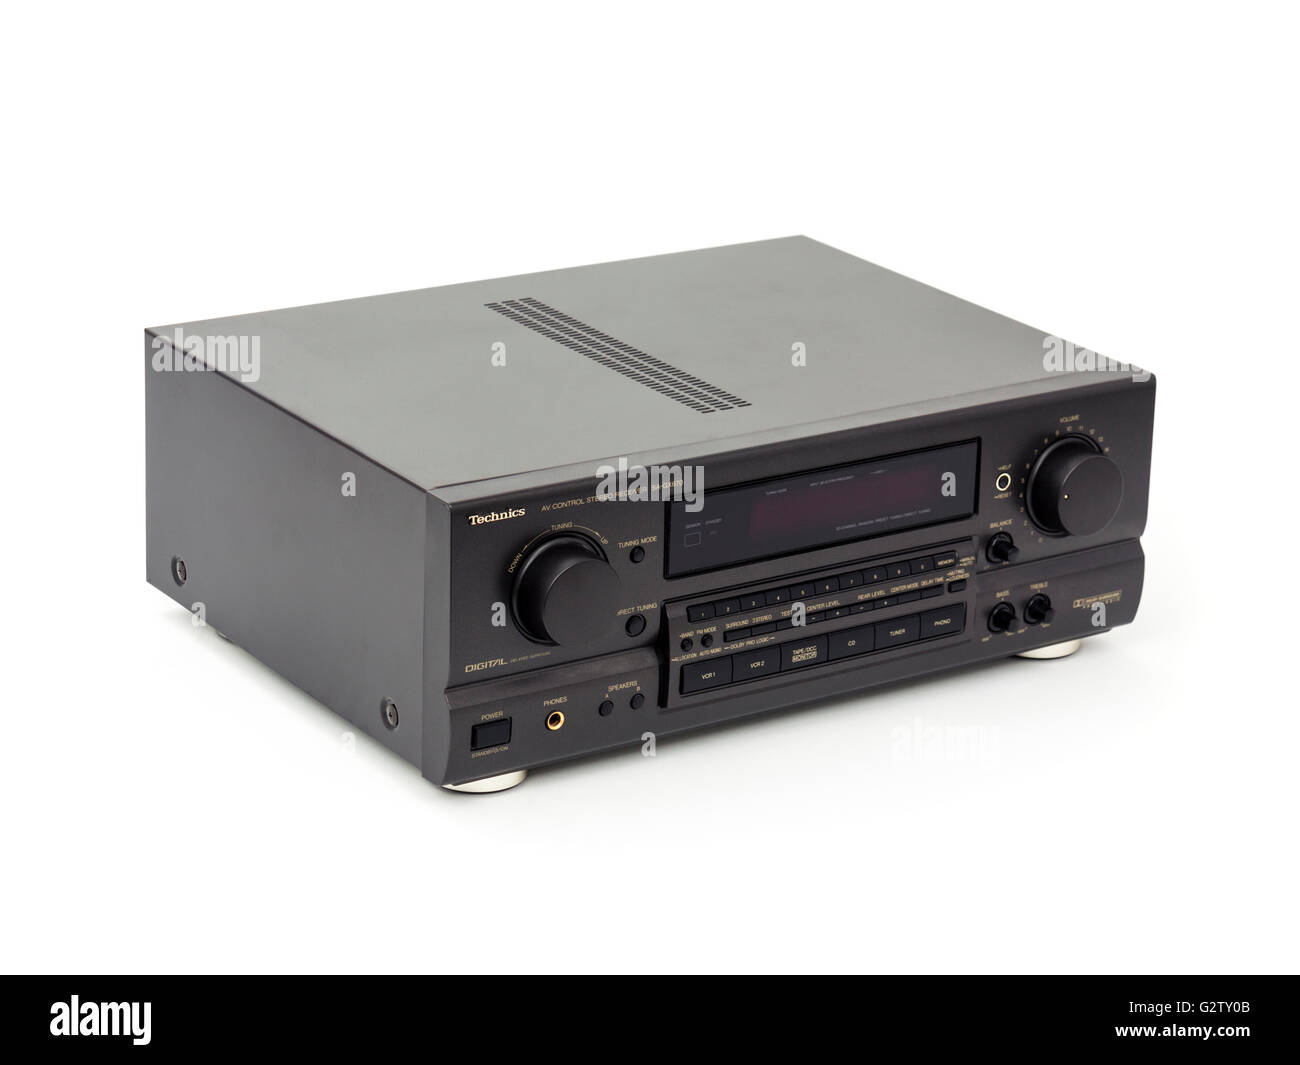 Technics SA-GX670 Stereo Receiver with AV (Surround Sound) capabilities from 1994 - Stock Image